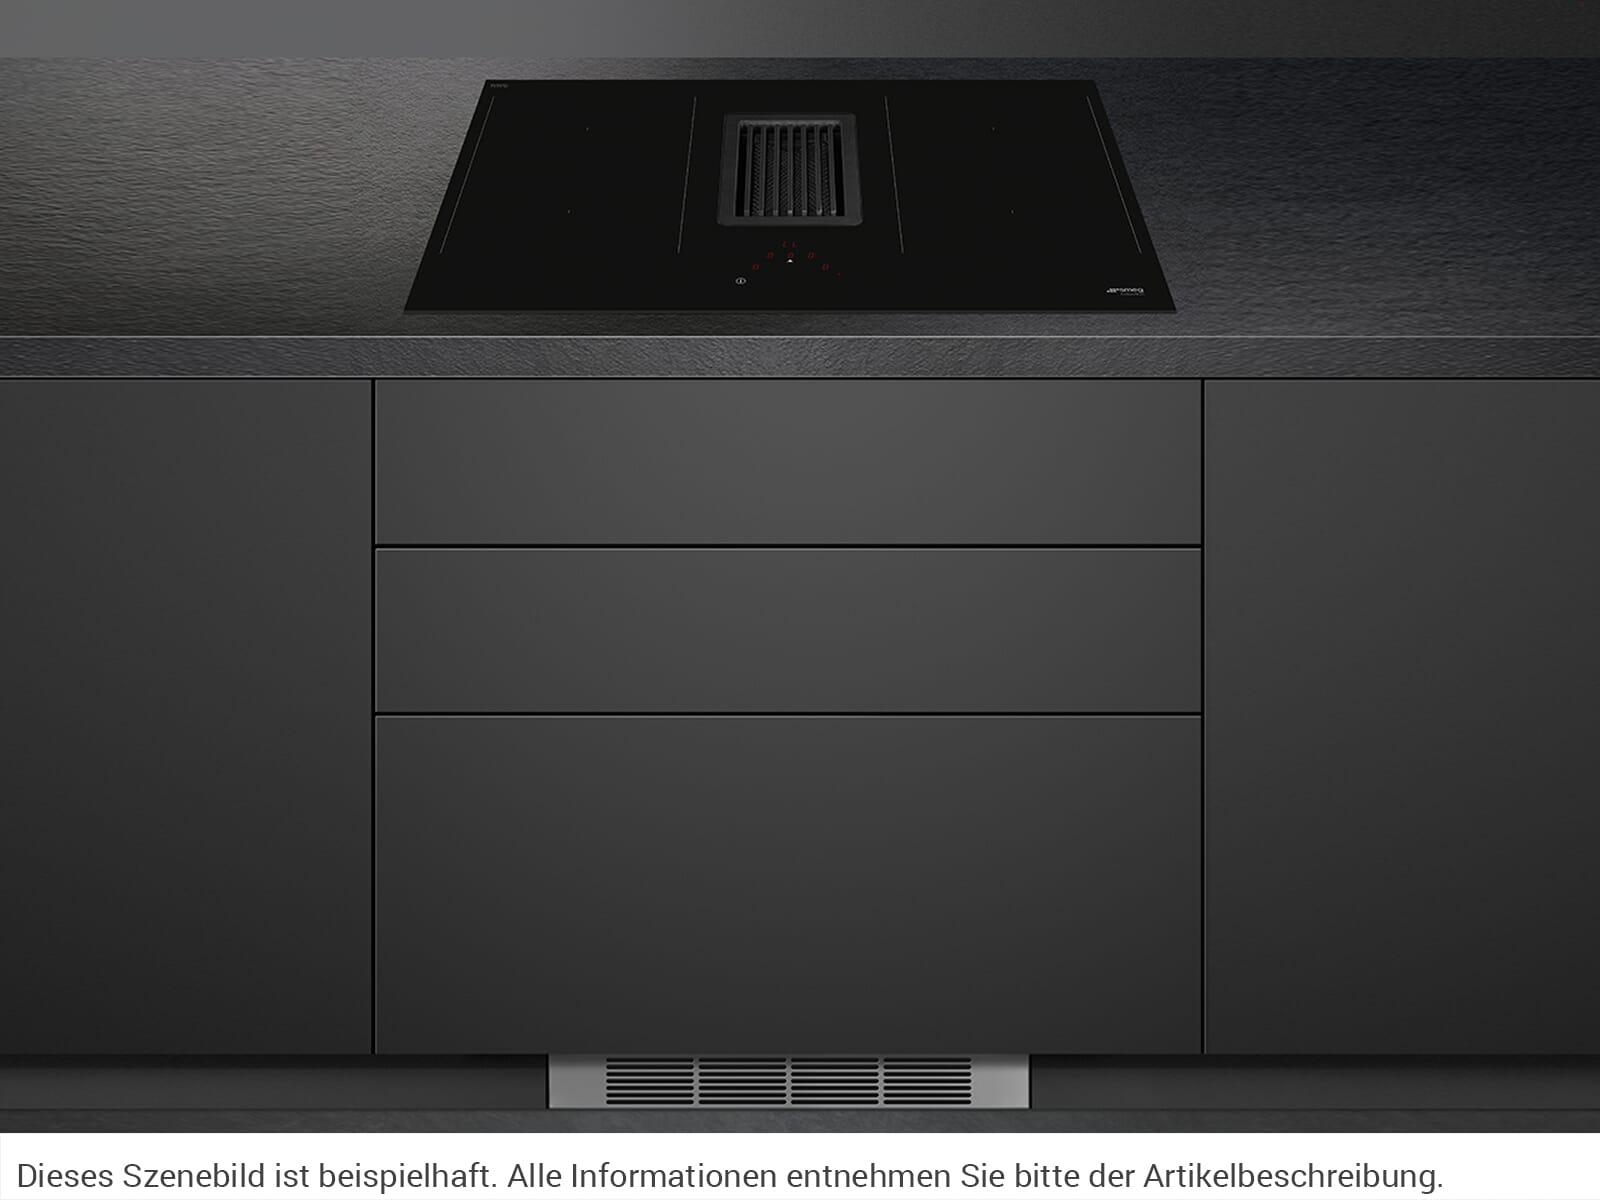 Smeg HOBD482d Induktionskochfeld-Dunstabzug-Kombination